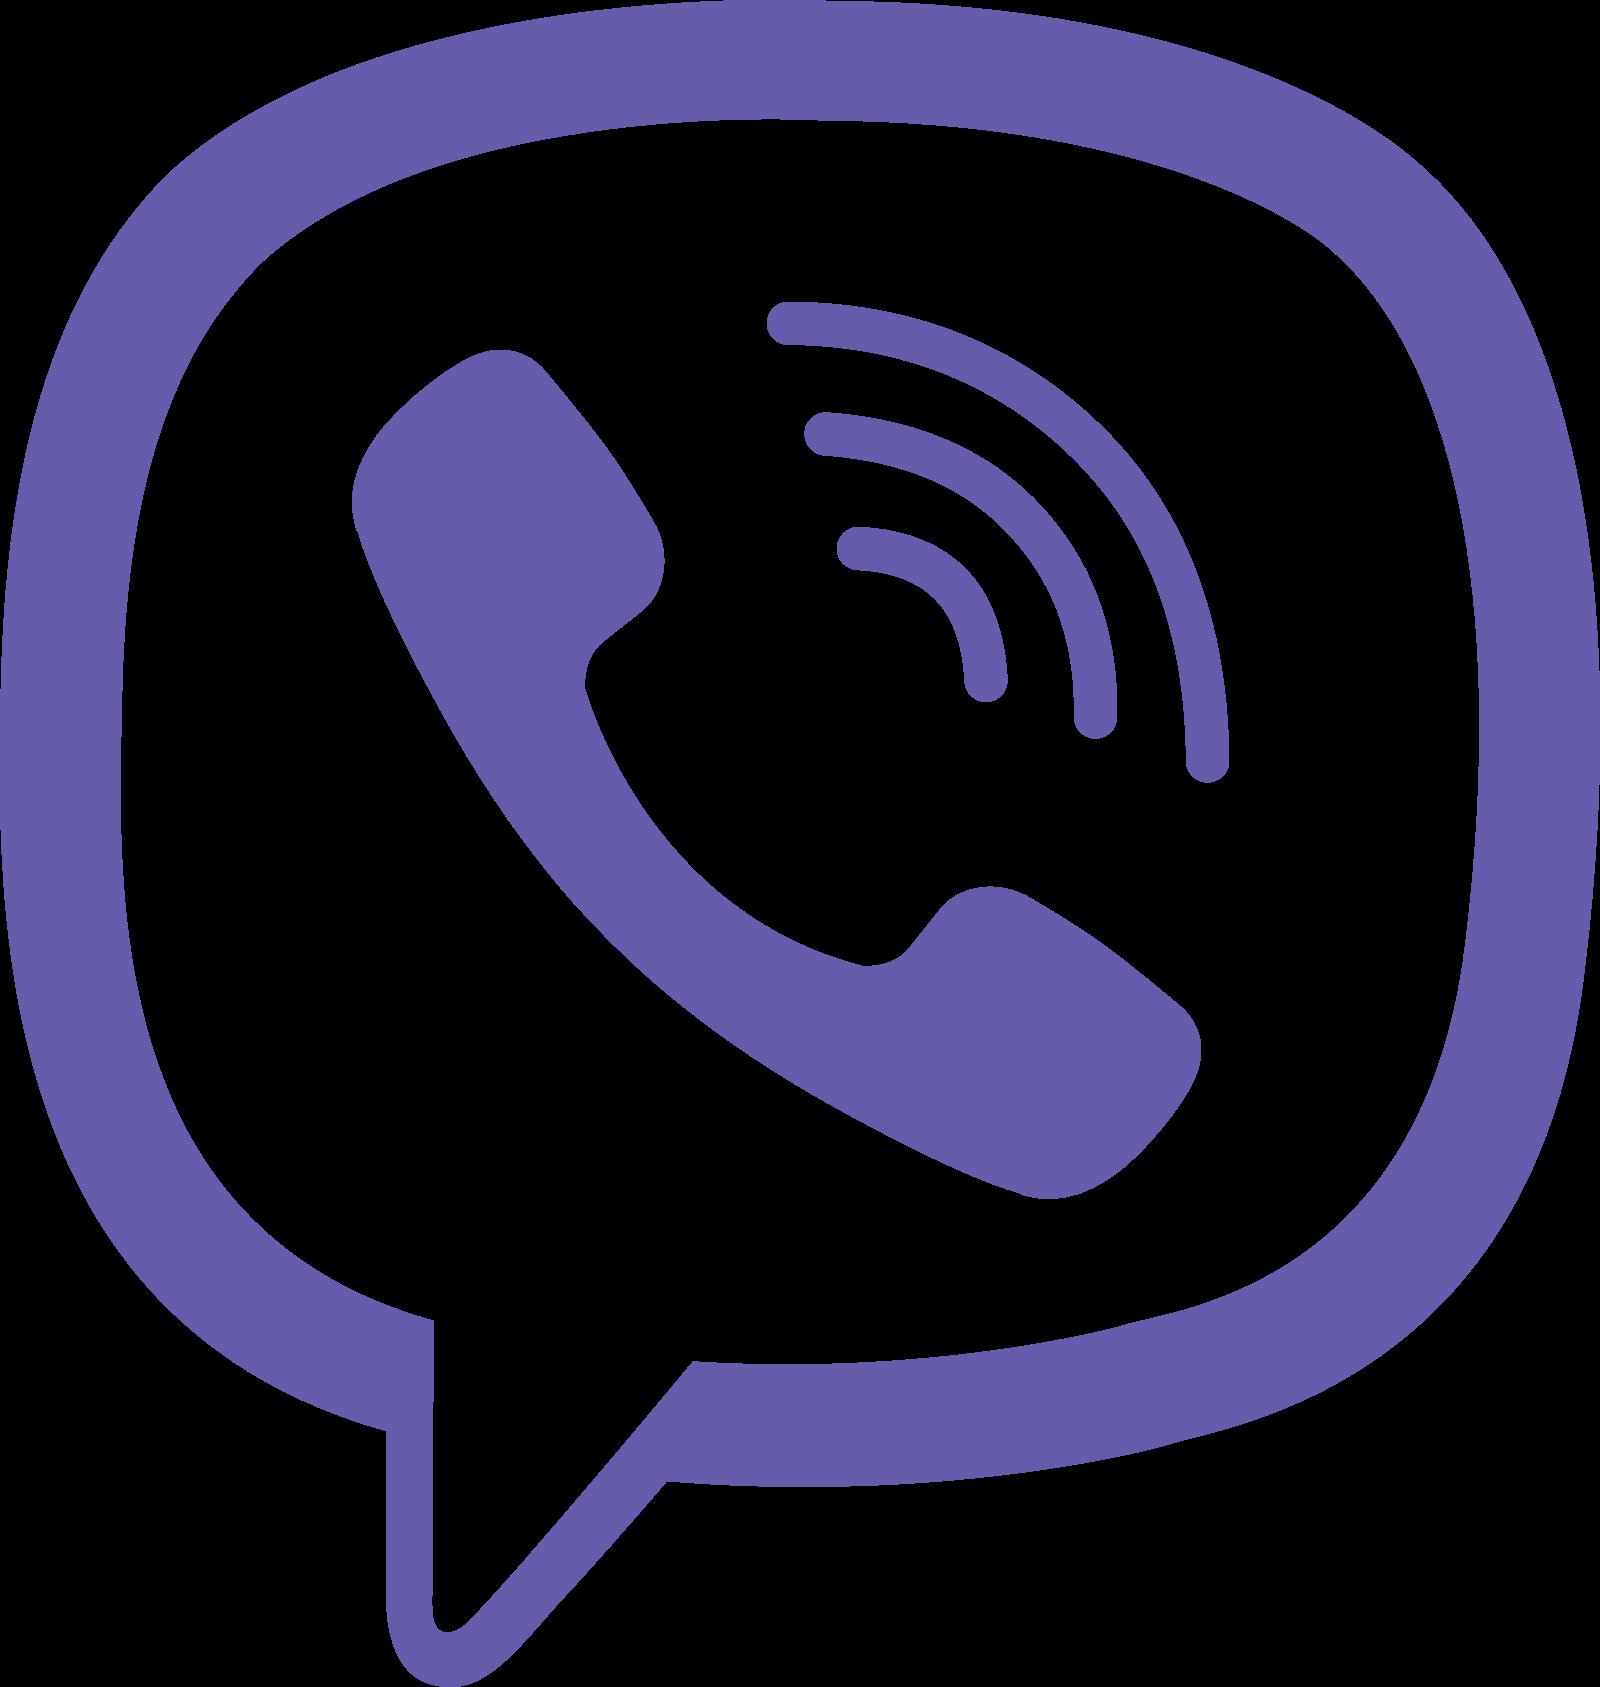 viber logo icon 4 - Rakuten Viber Logo - Icon